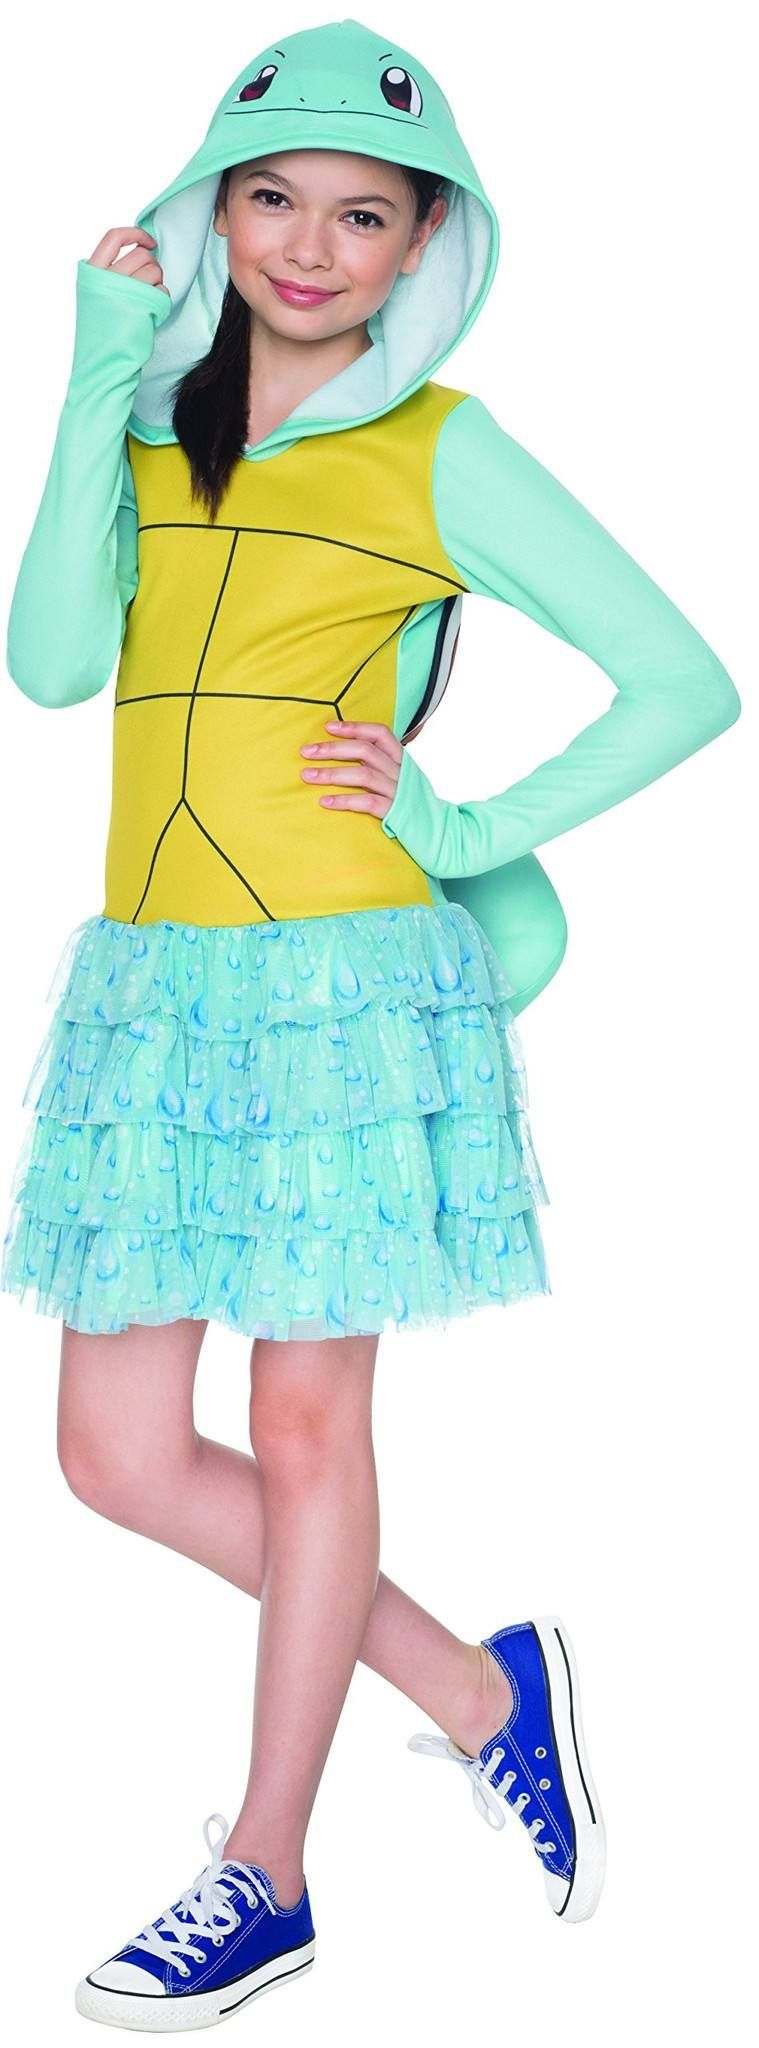 Child Medium - Pokémon Squirtle Hooded Costume Dress